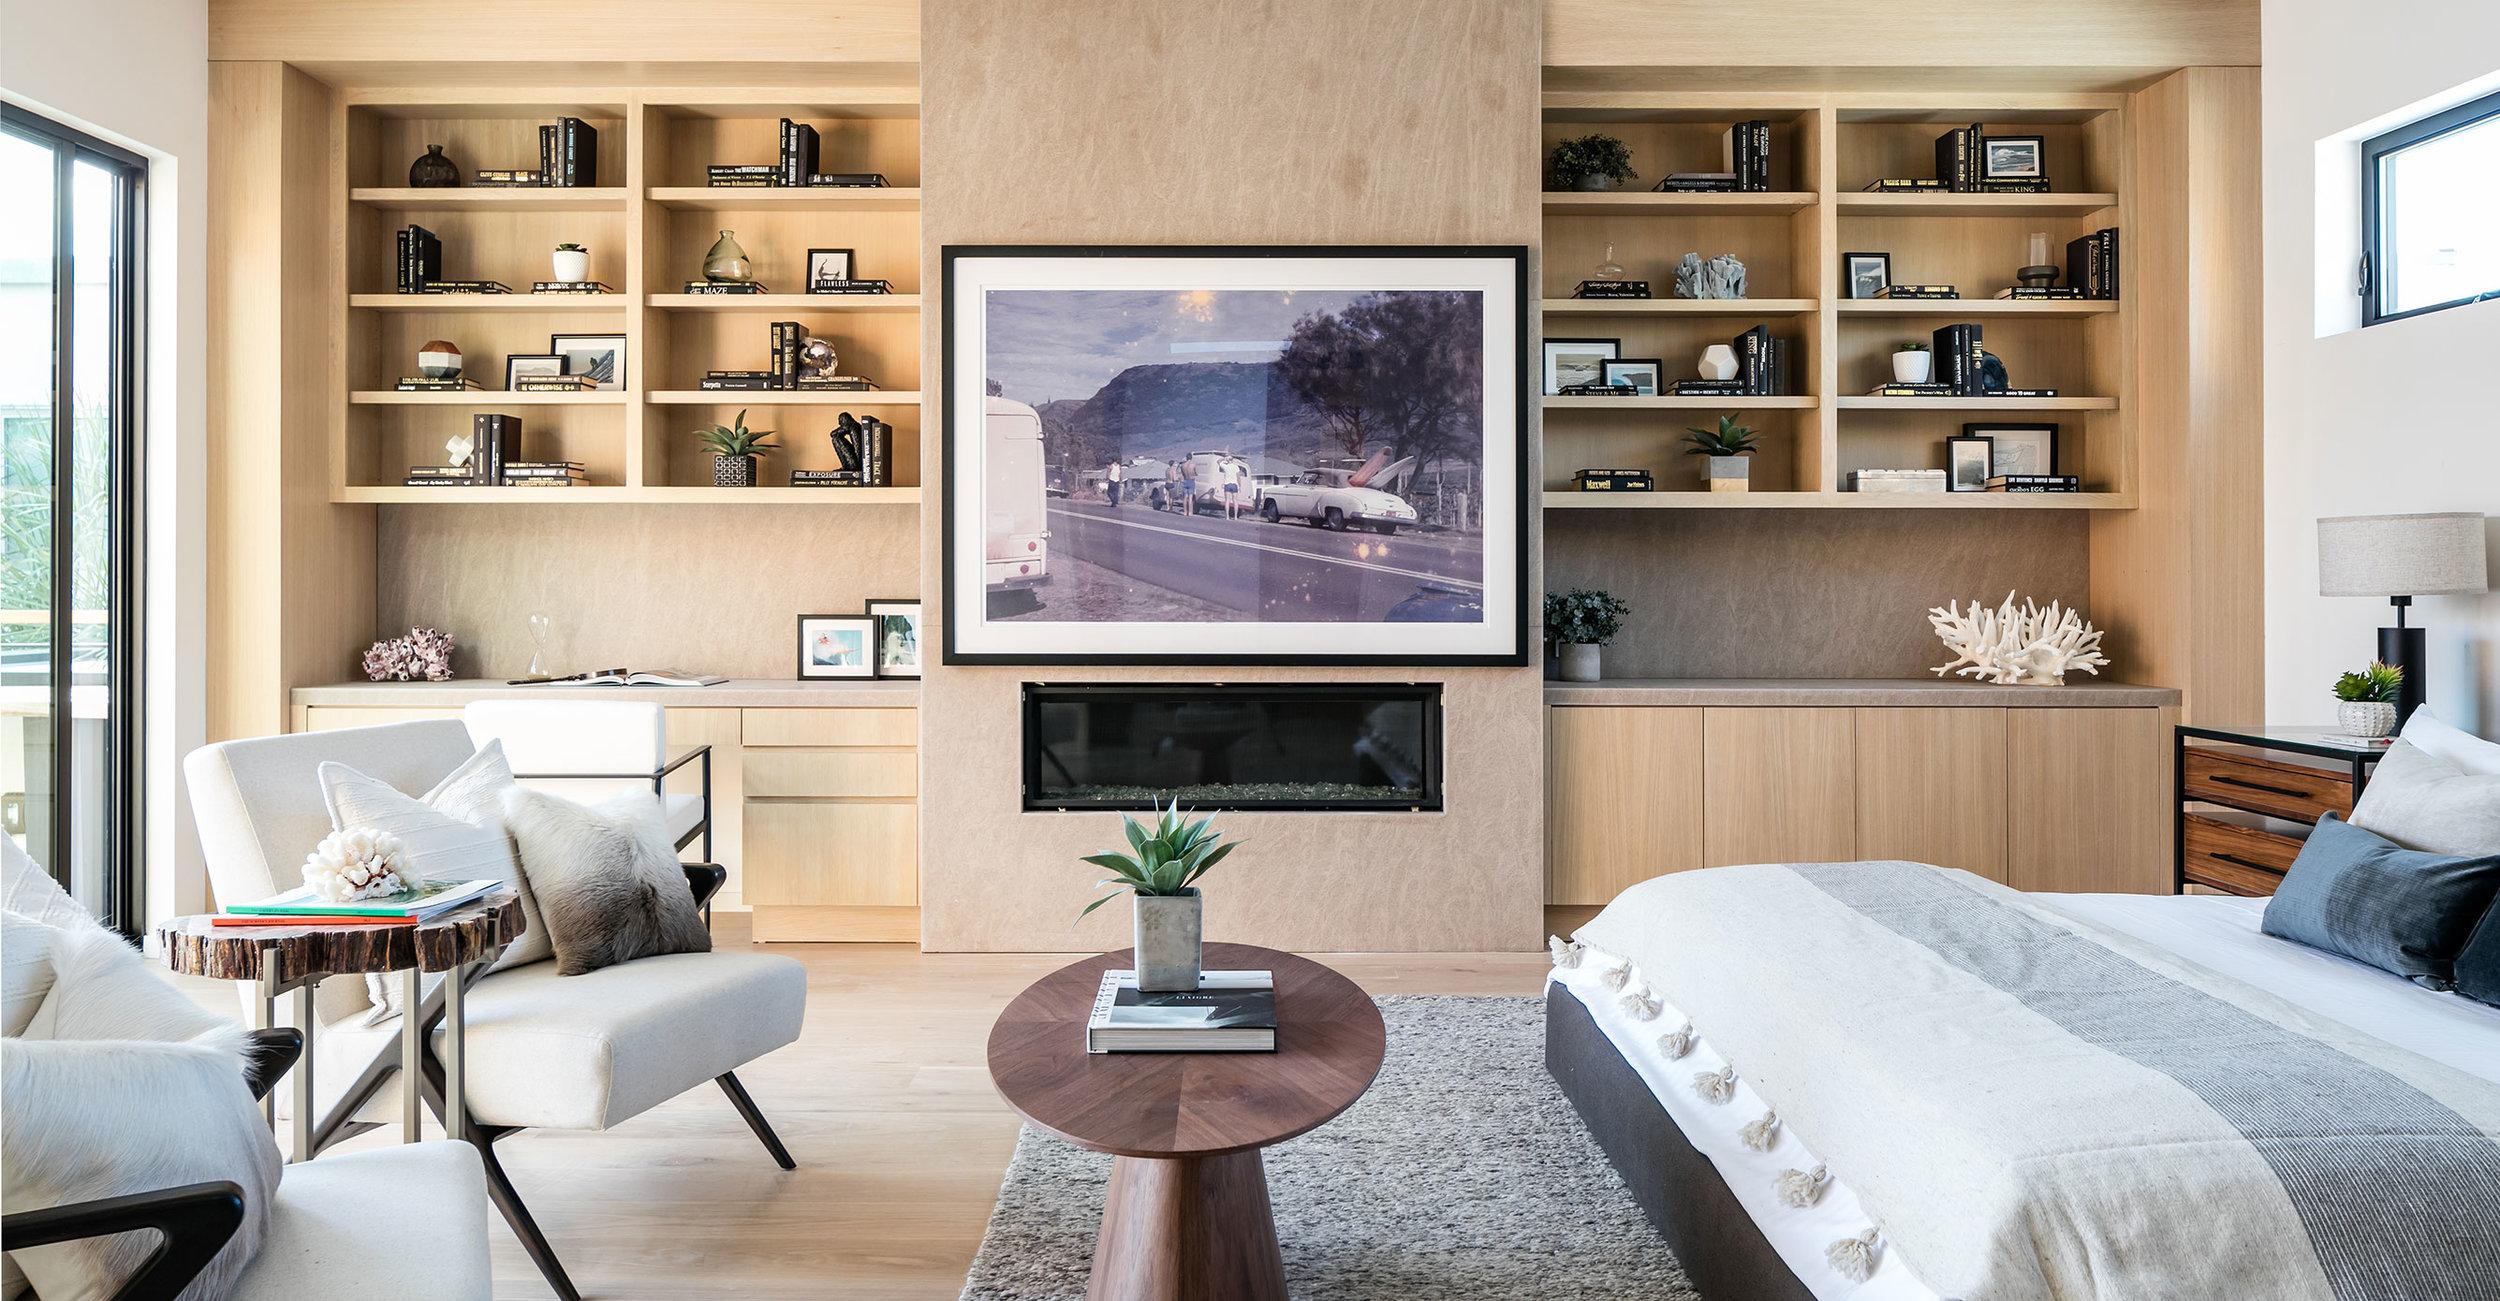 8-SiliconBay-modern-master-bedroom-fireplace-Los-Angeles.jpg